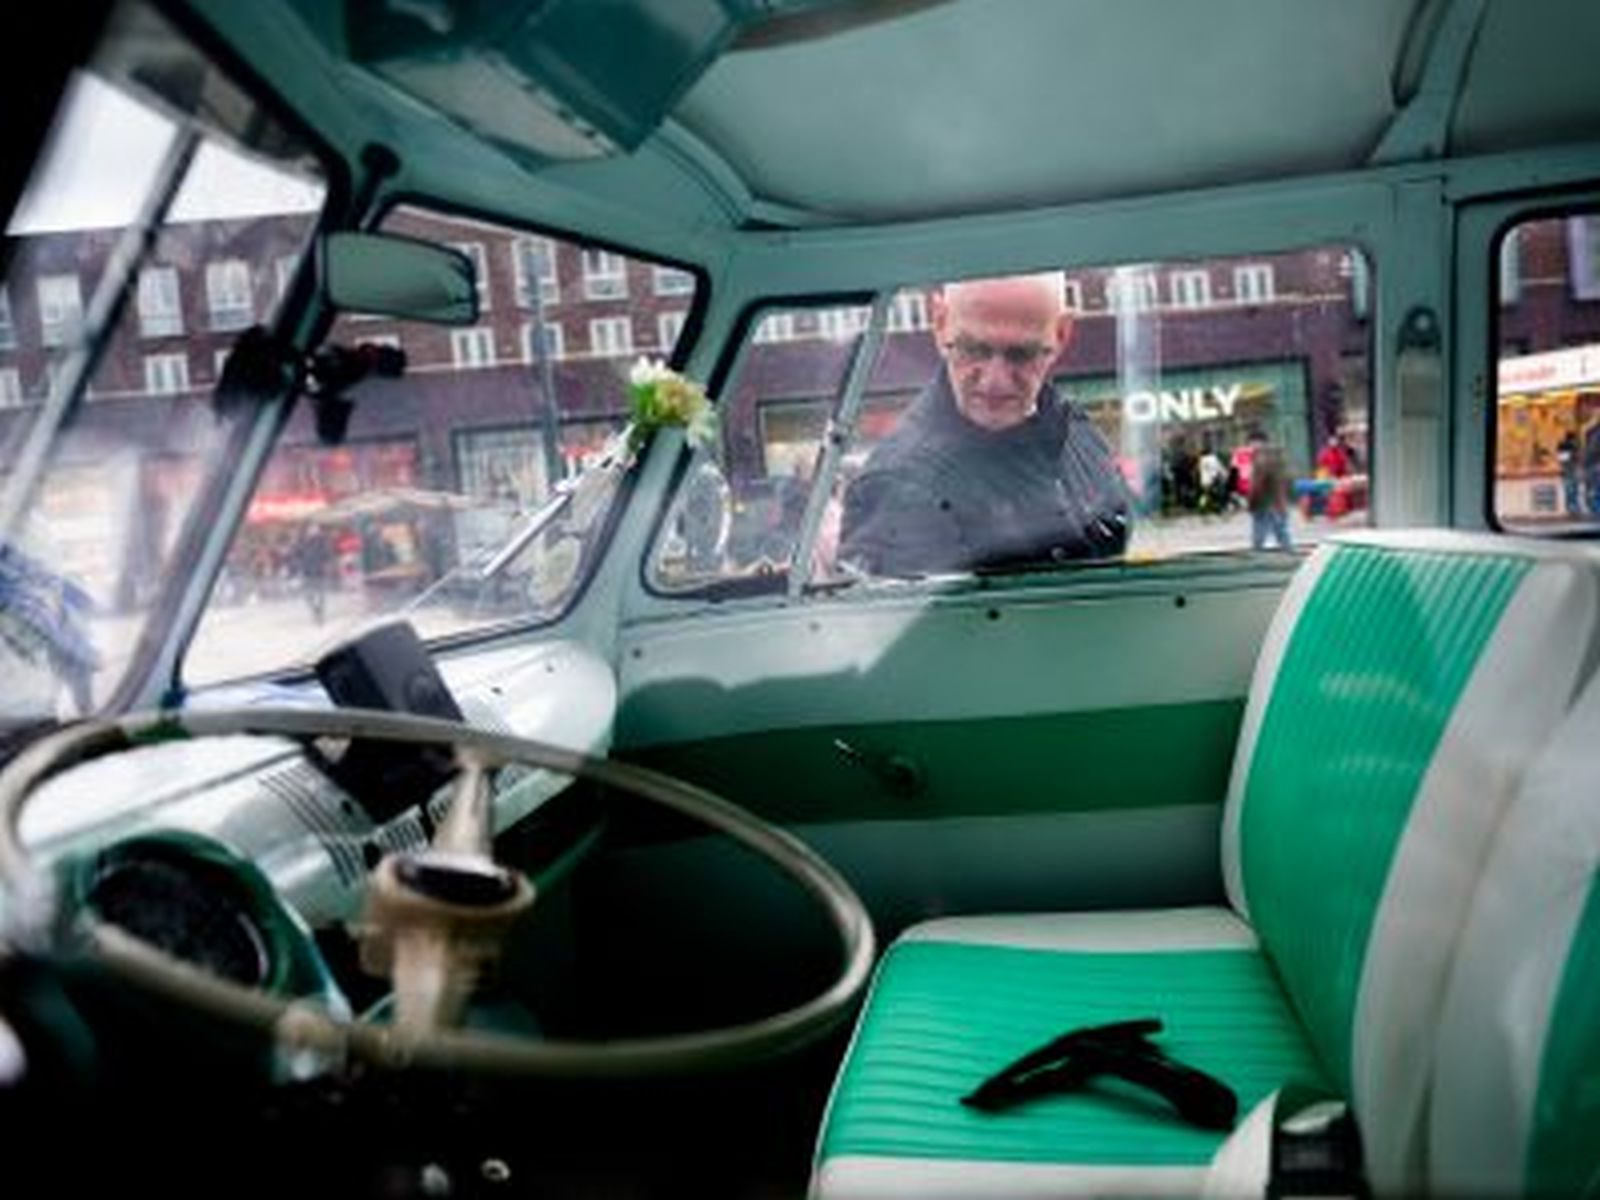 Trucks & Cars VHP-3154